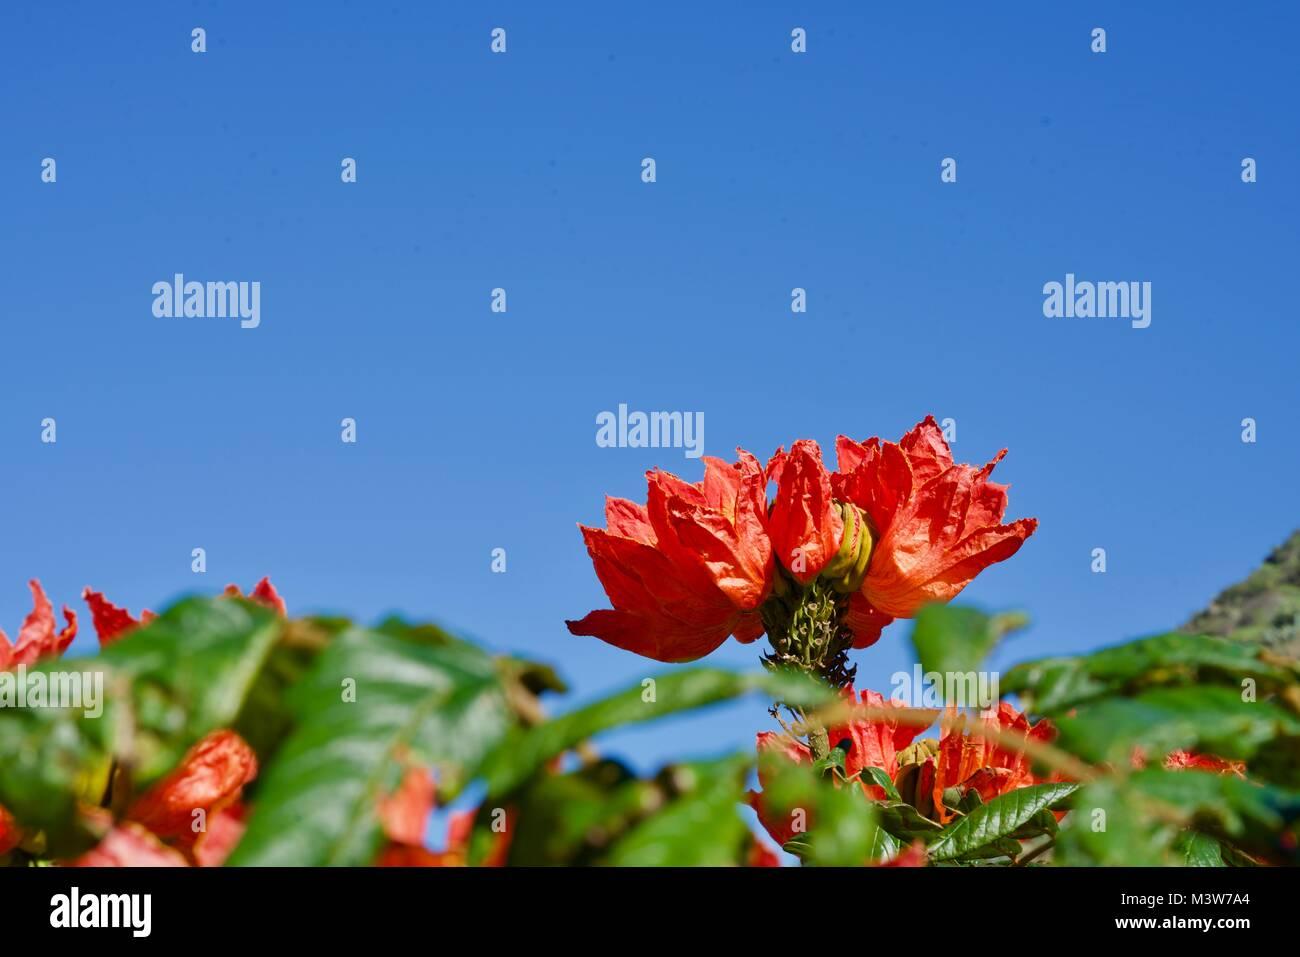 closeup of a brillant blossom of a tulip tree - Stock Image